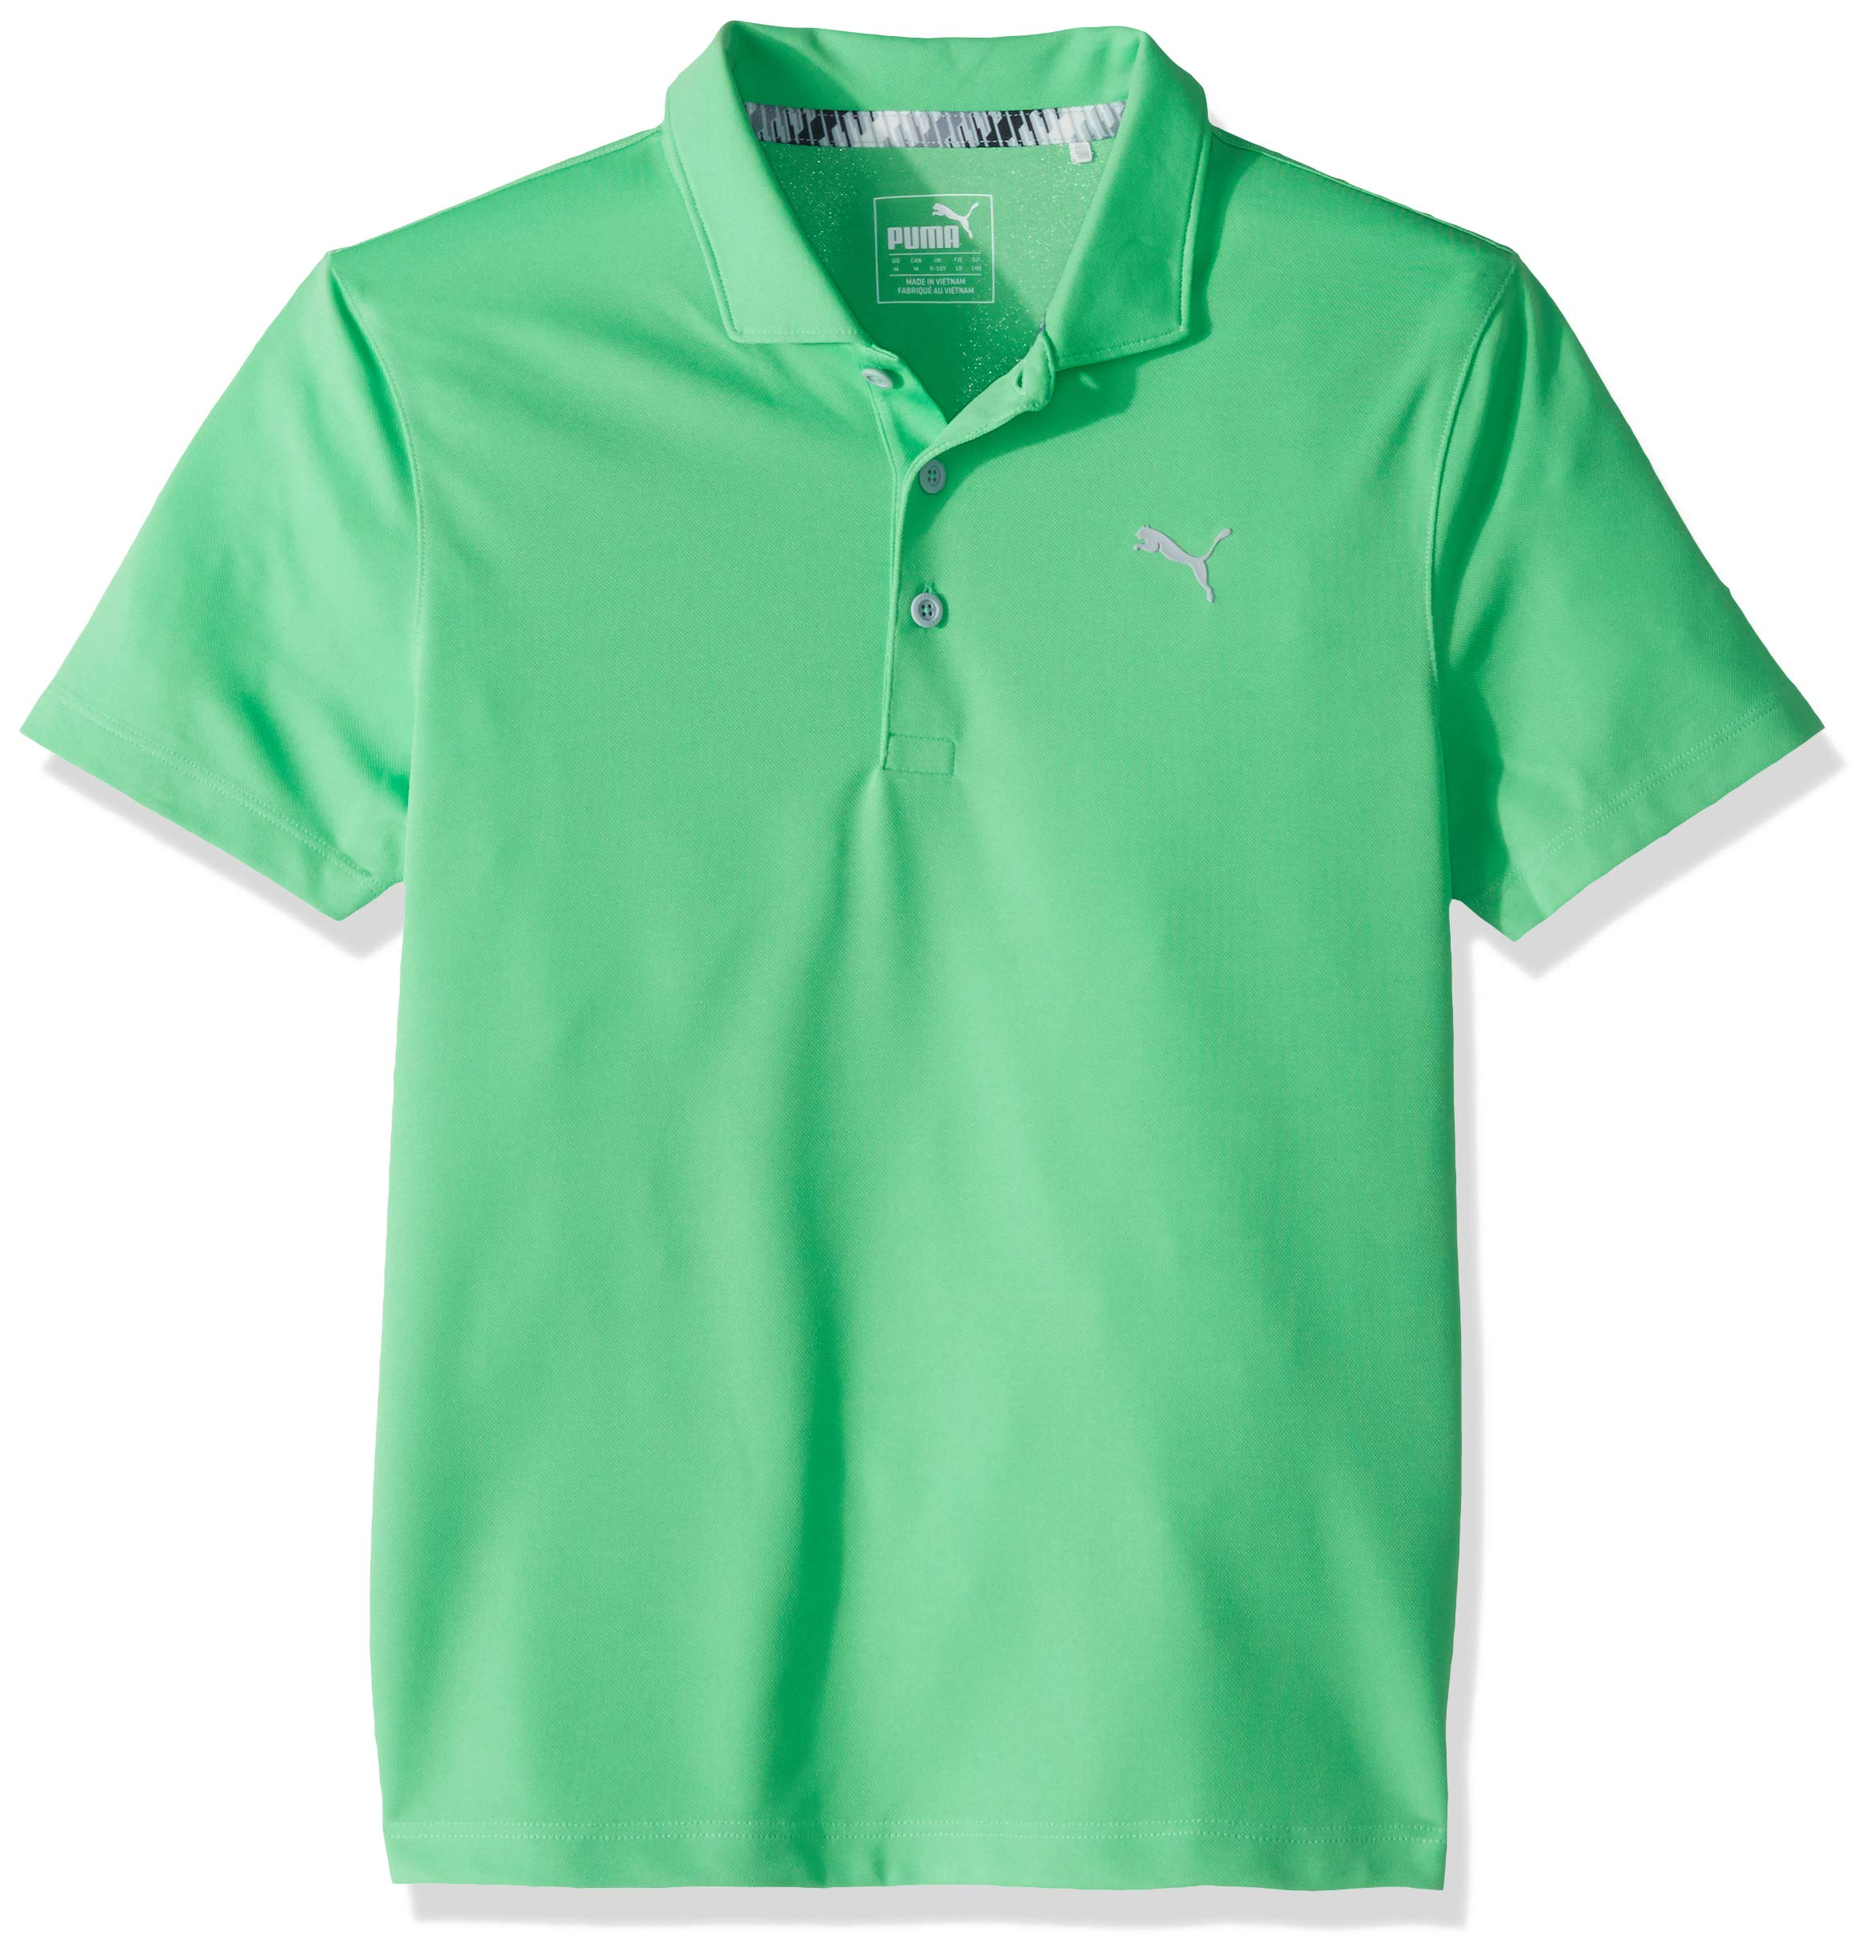 Puma Golf Boys 2019 Polo, Irish Green, x Small